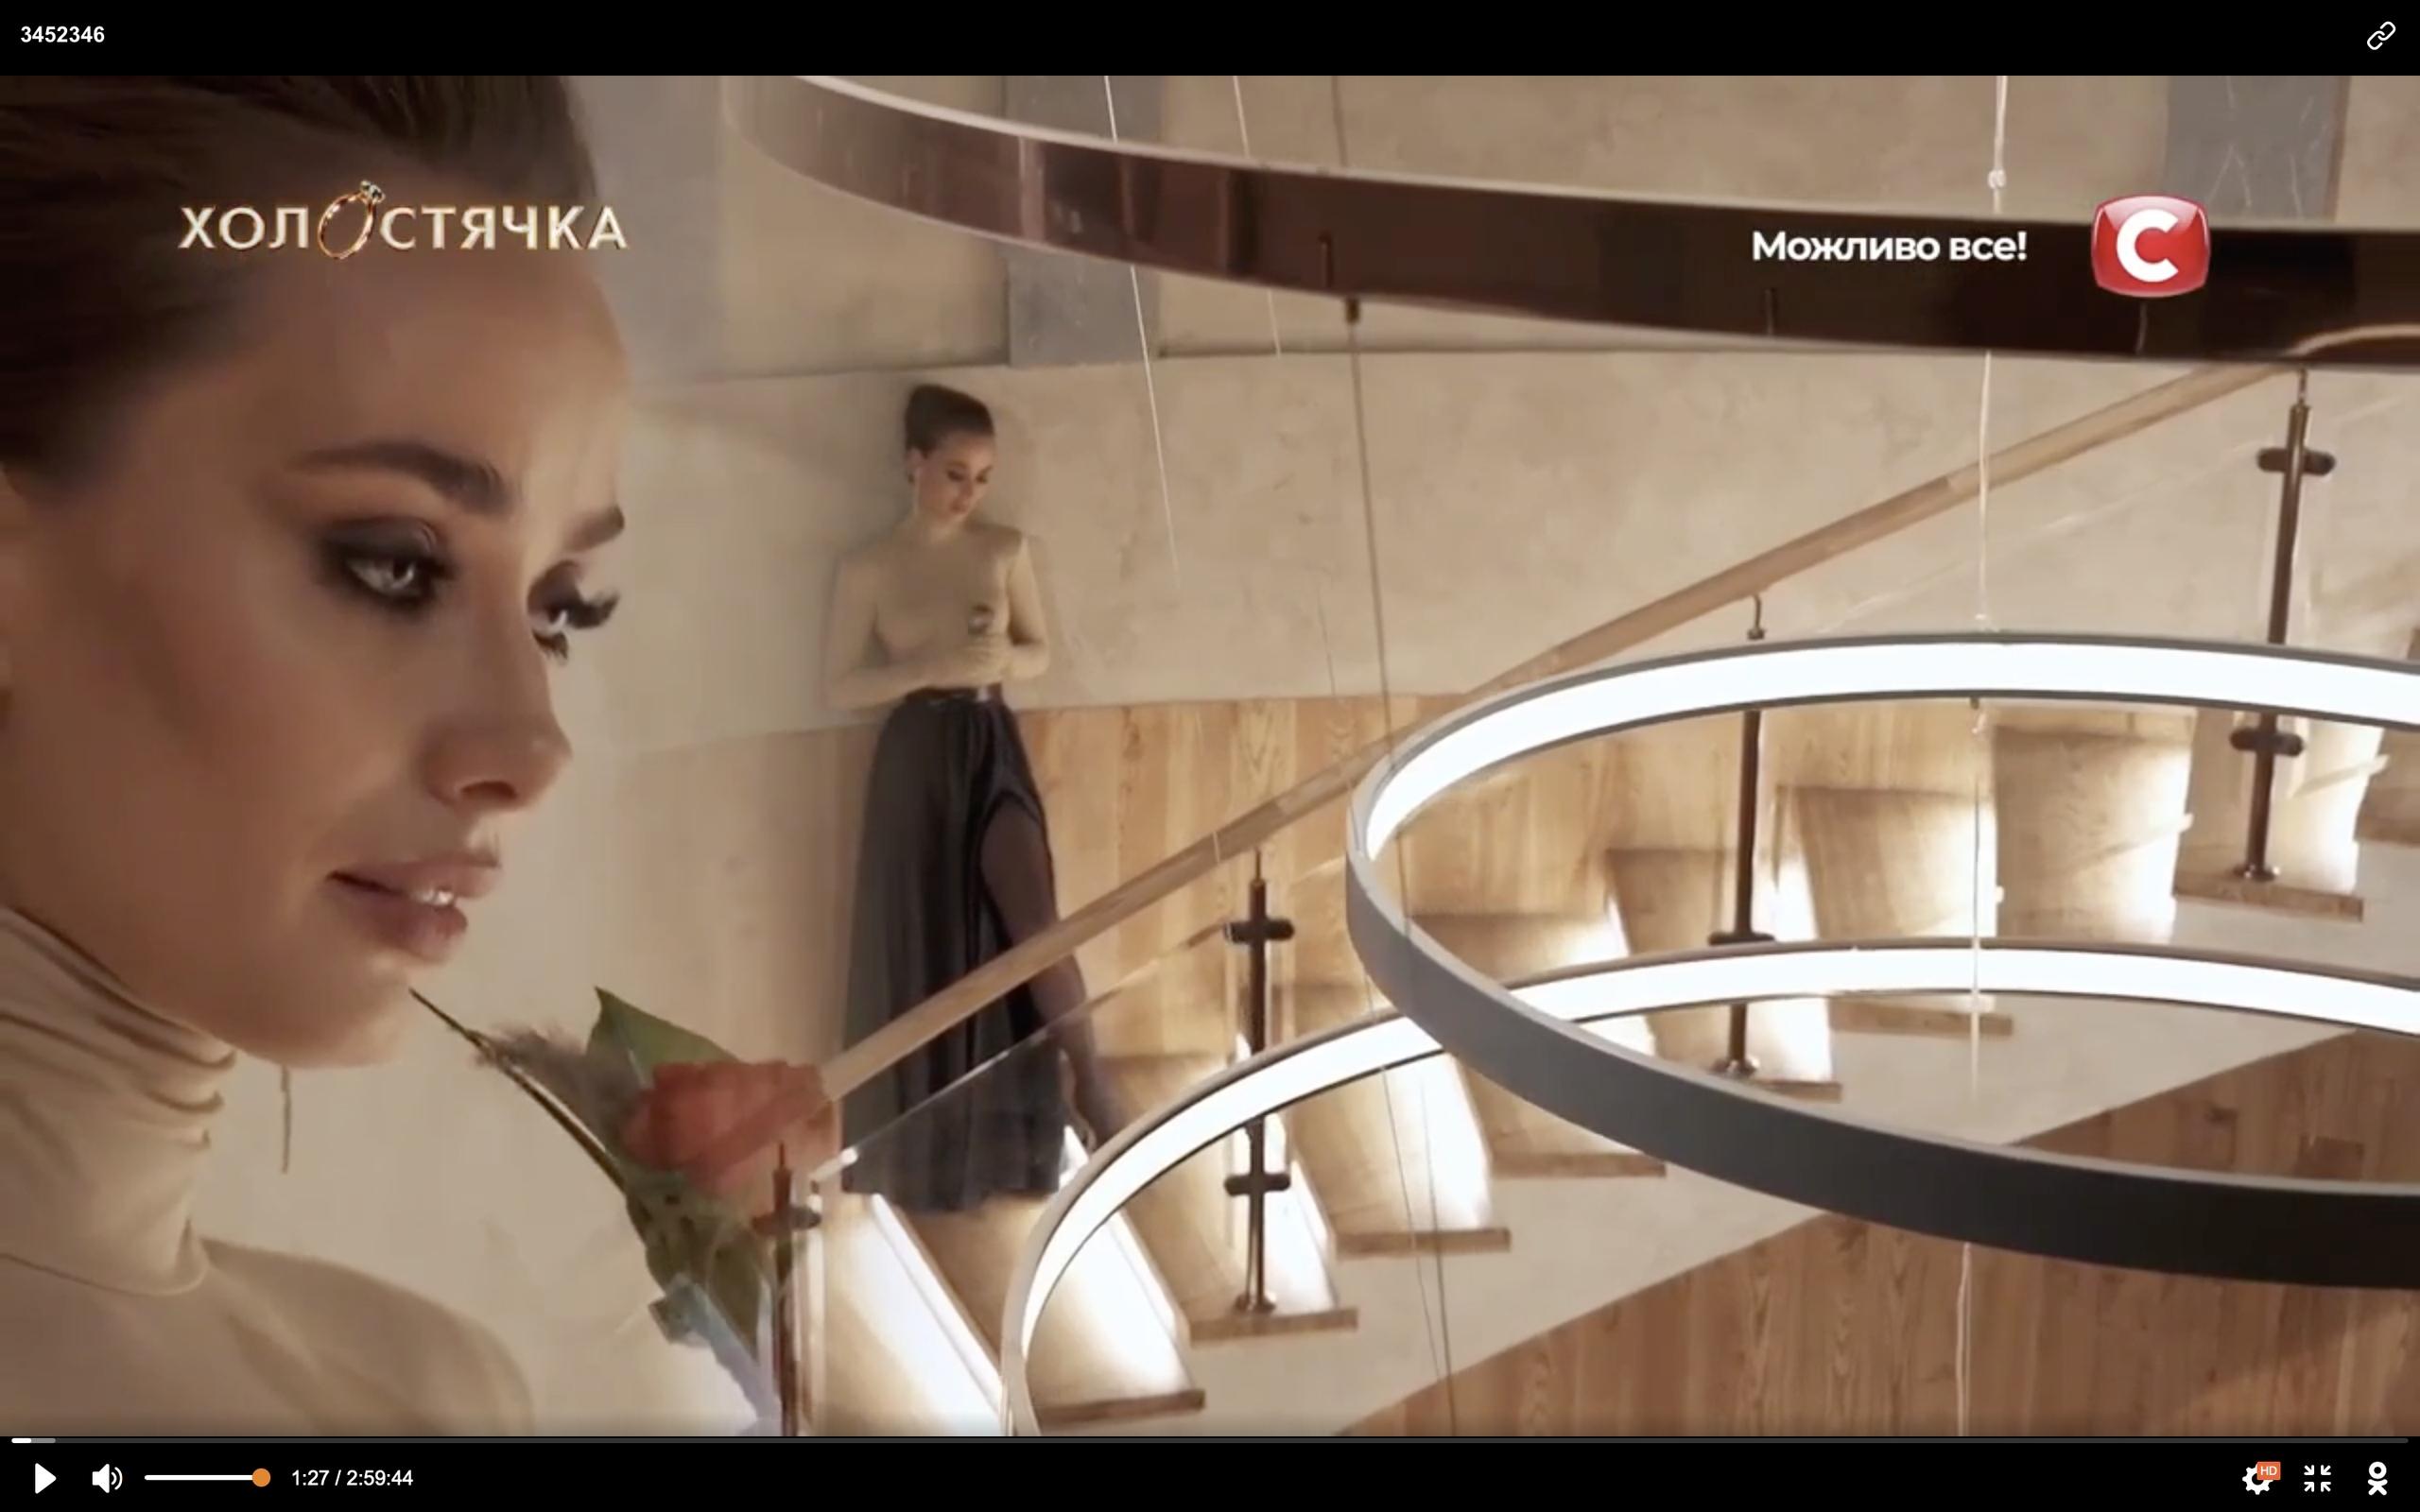 Bachelorette Ukraine - Season 1 - Ksenia Mishina - Episode Discussion - *Sleuthing Spoilers* - Page 11 CVQmR_zxMu0